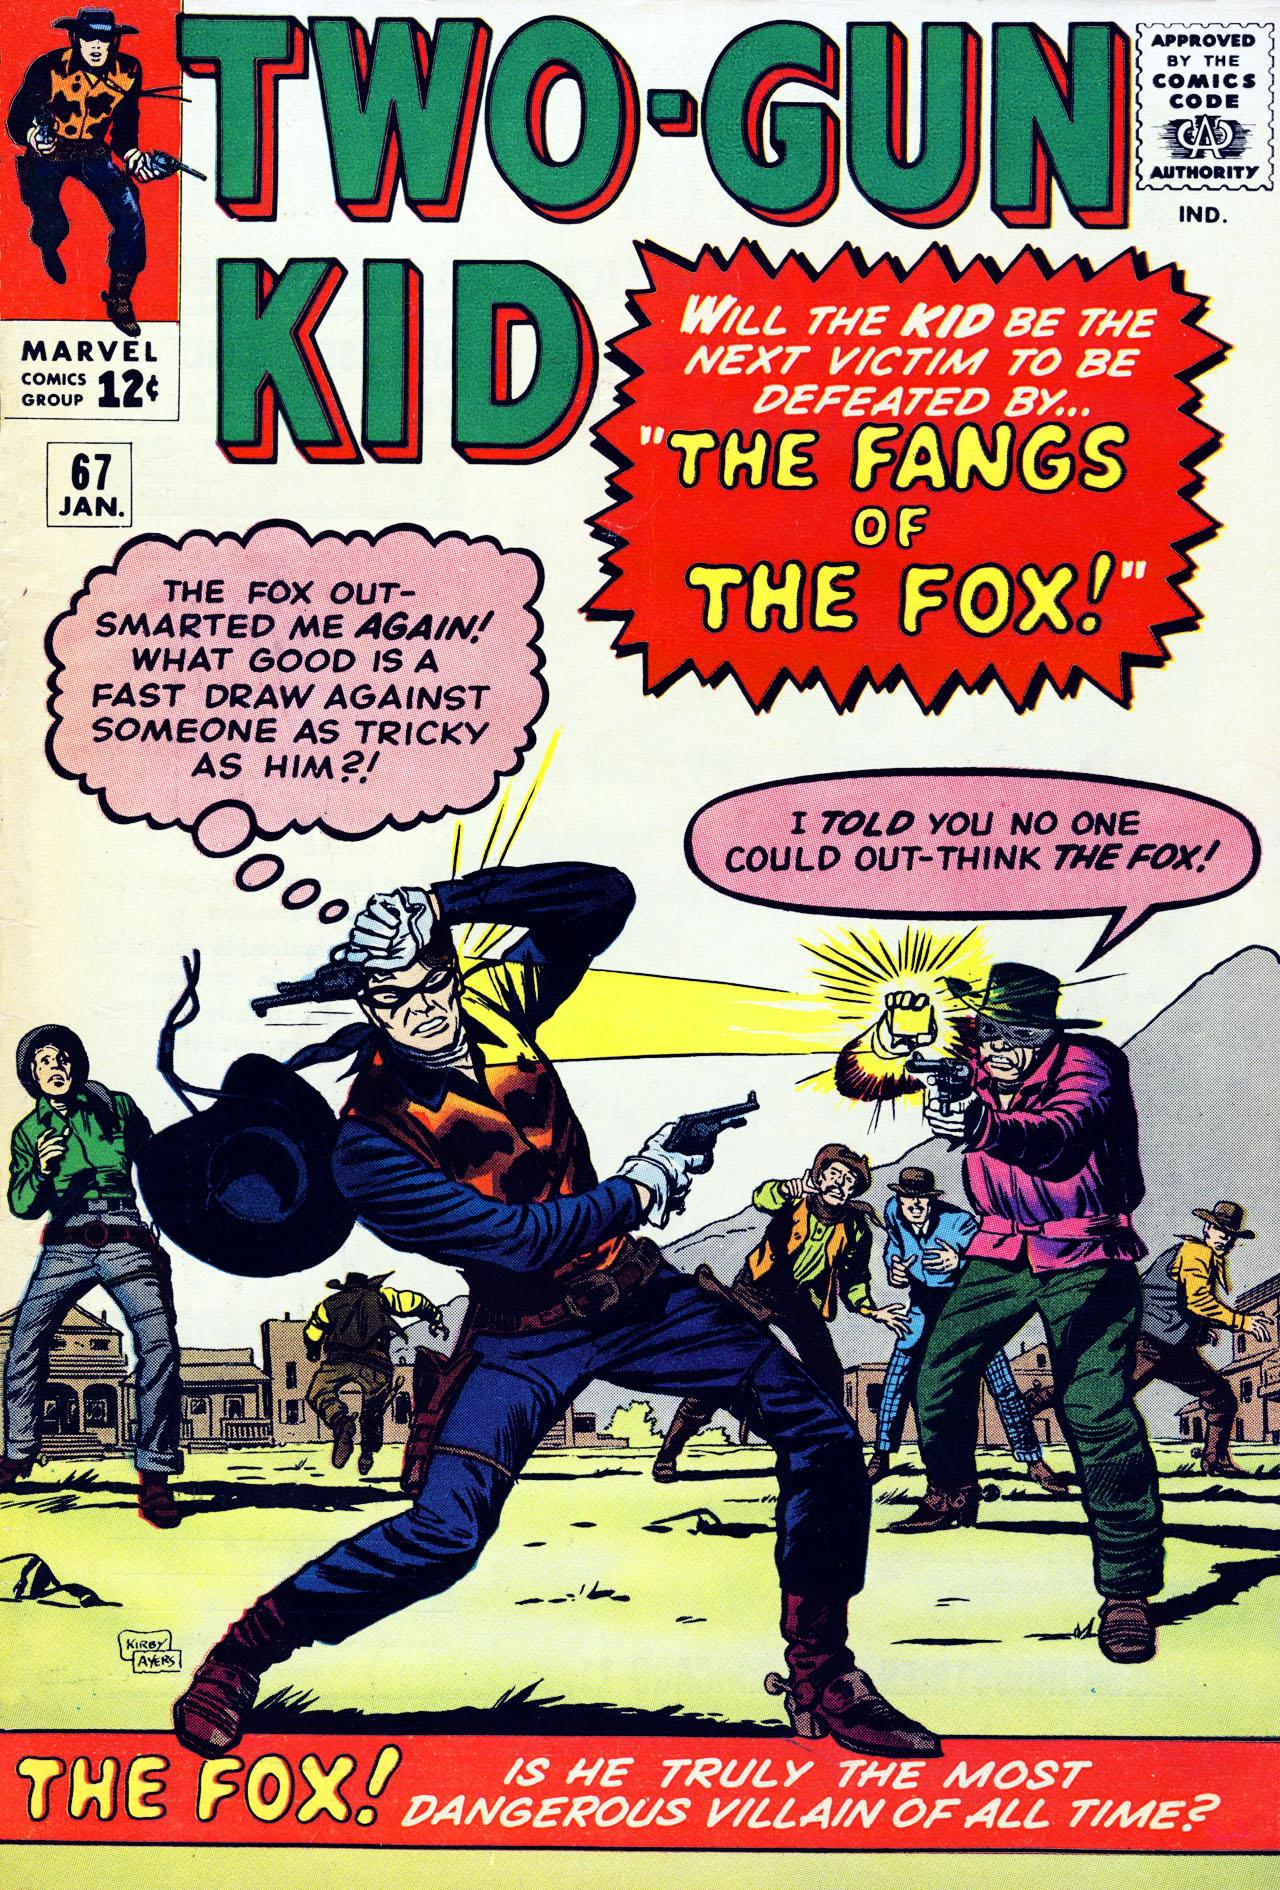 Read online Two-Gun Kid comic -  Issue #67 - 1